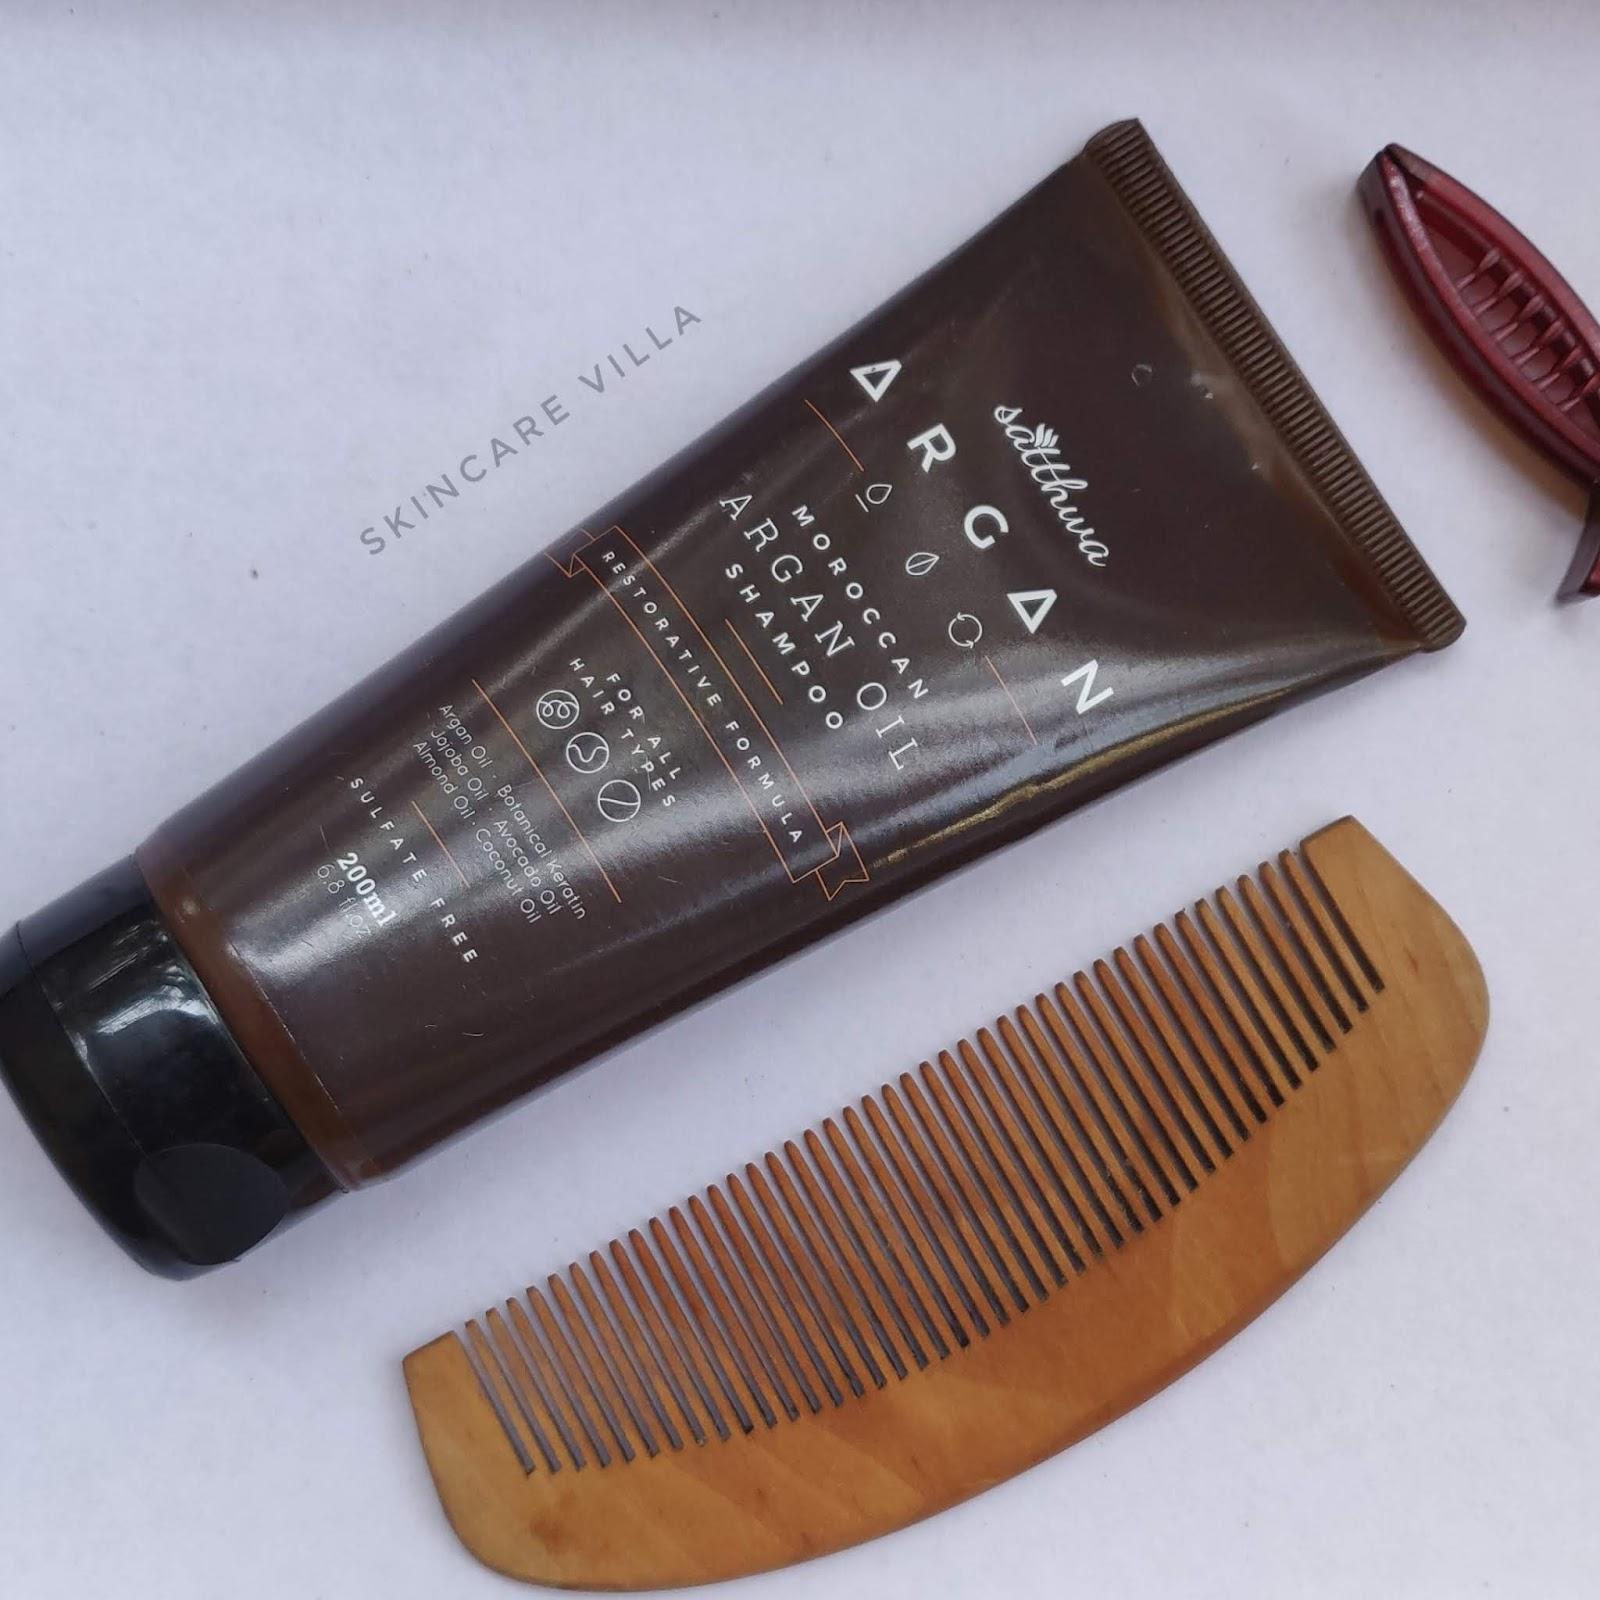 Satthwa Moroccan Argan Oil Shampoo Review